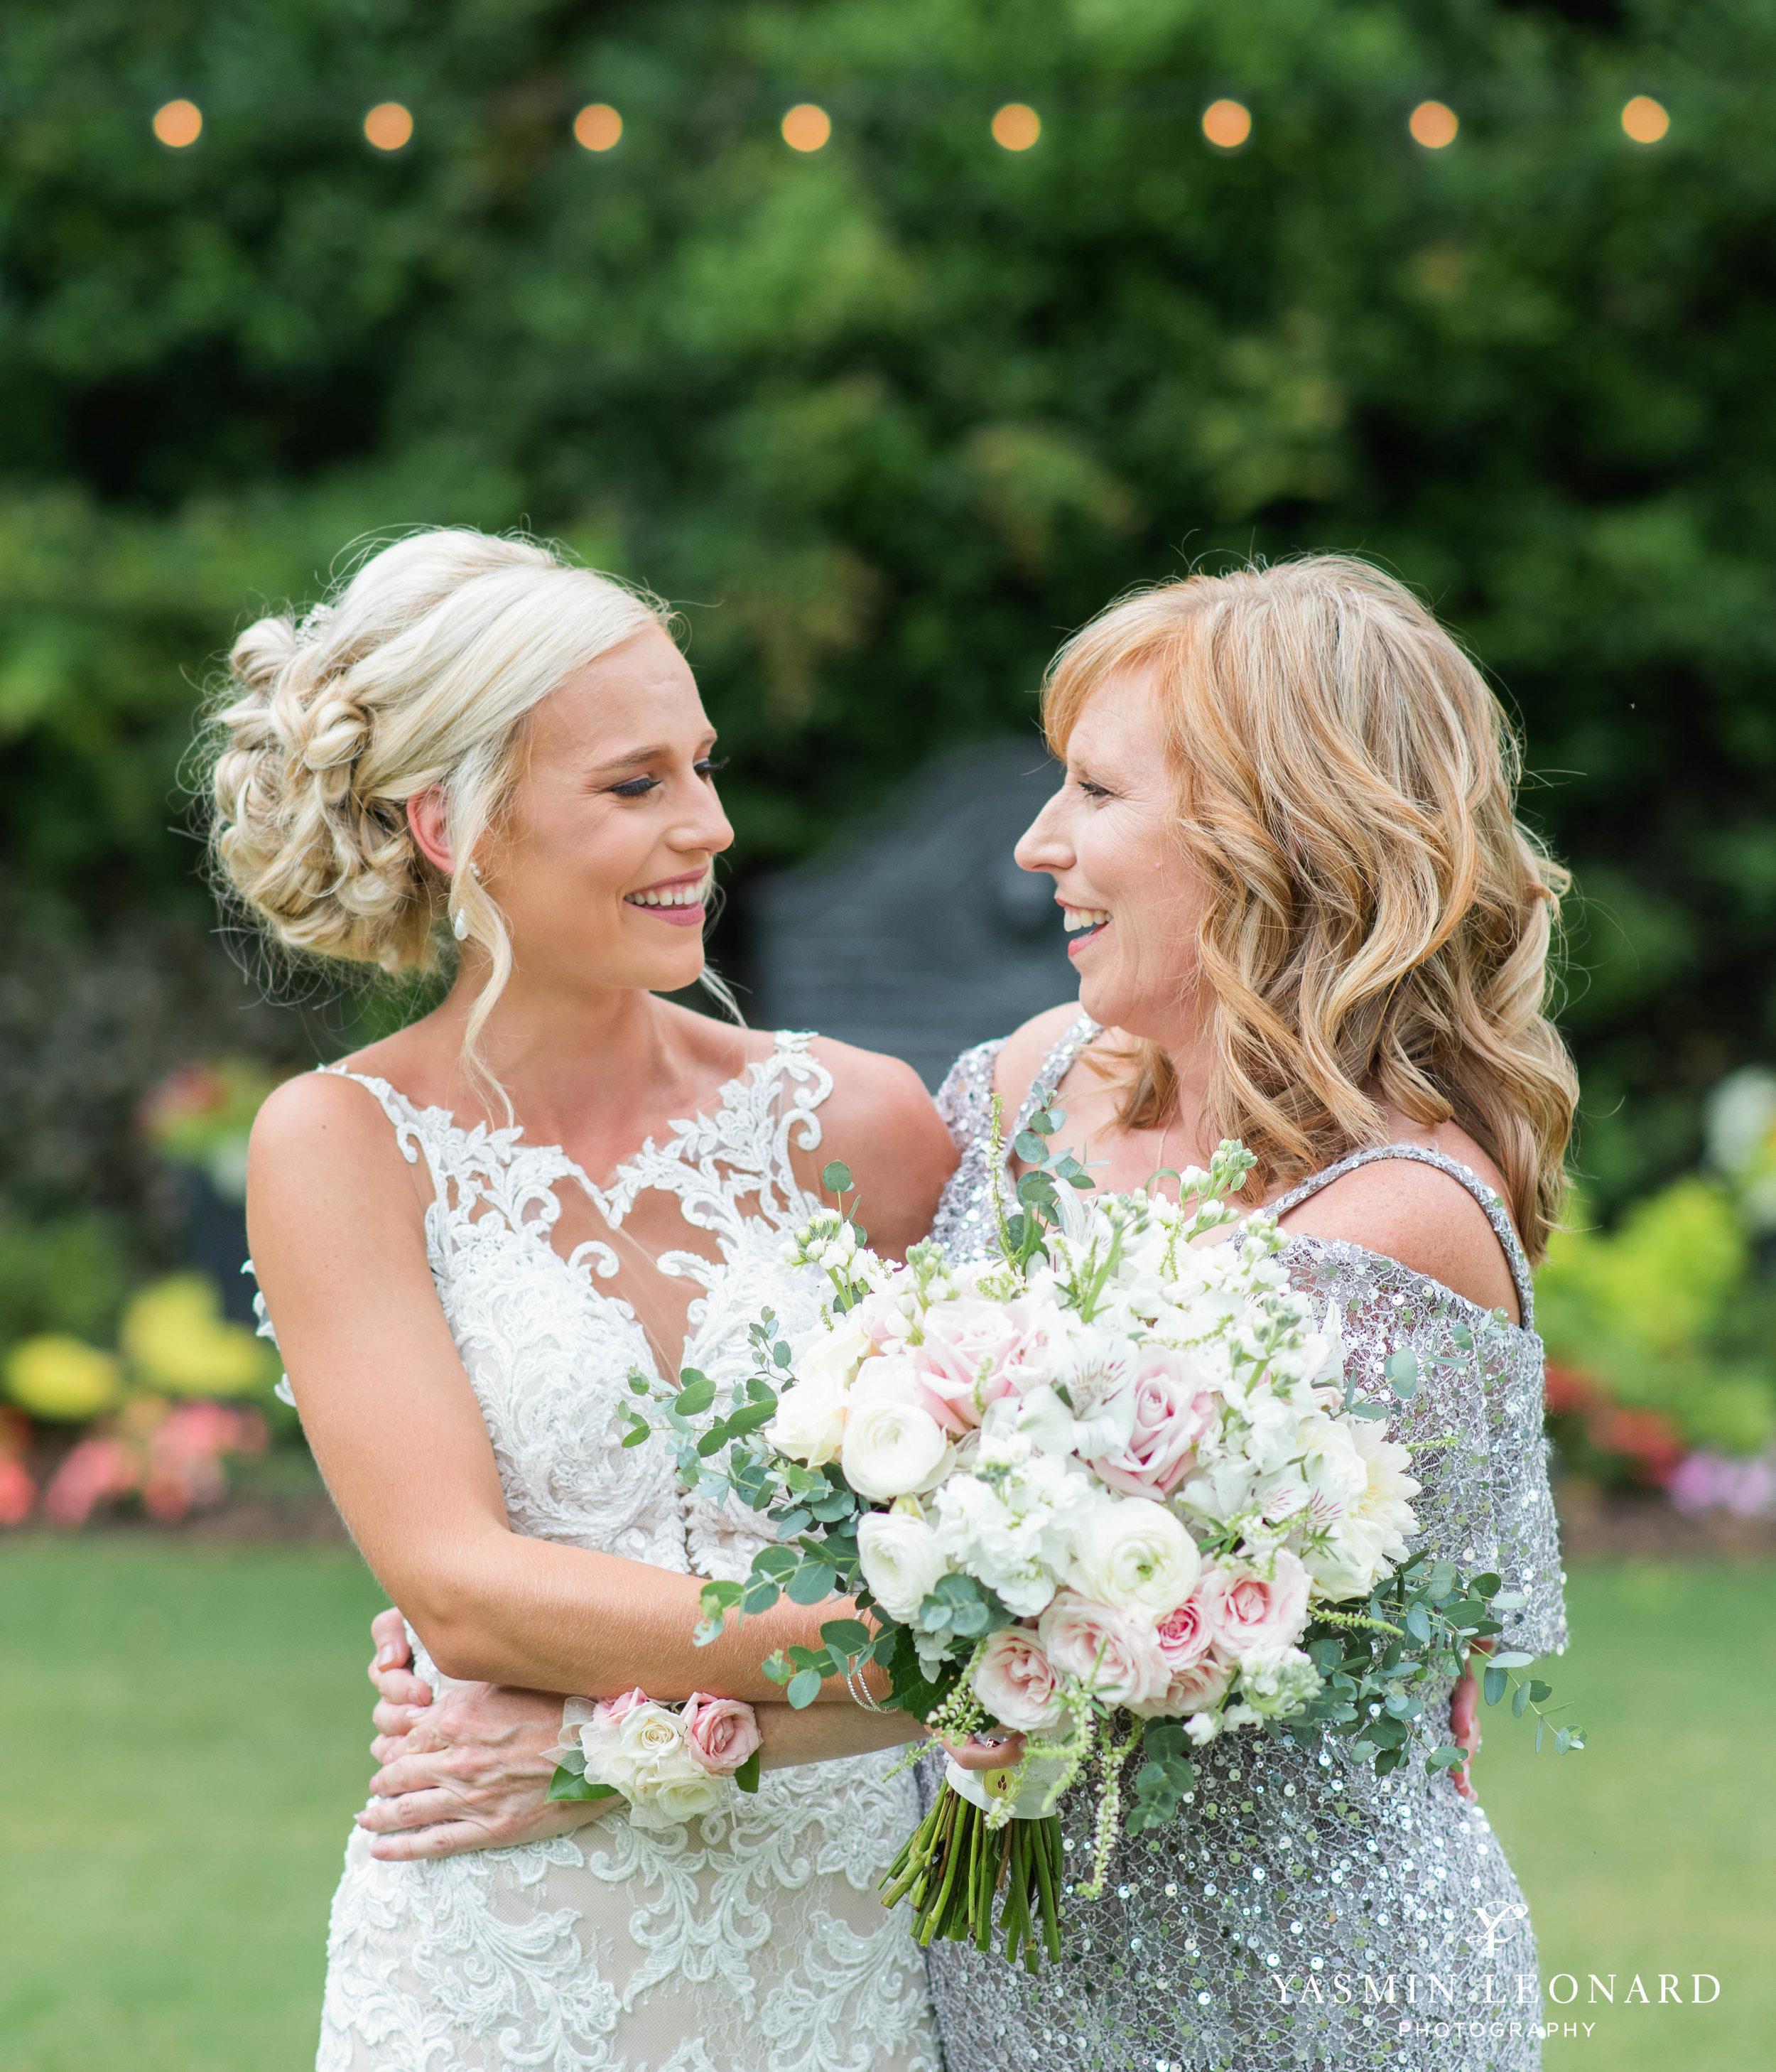 Separk Mansion - NC Weddings - Gastonia Wedding - NC Wedding Venues - Pink and Blue Wedding Ideas - Pink Bridesmaid Dresses - Yasmin Leonard Photography-16.jpg